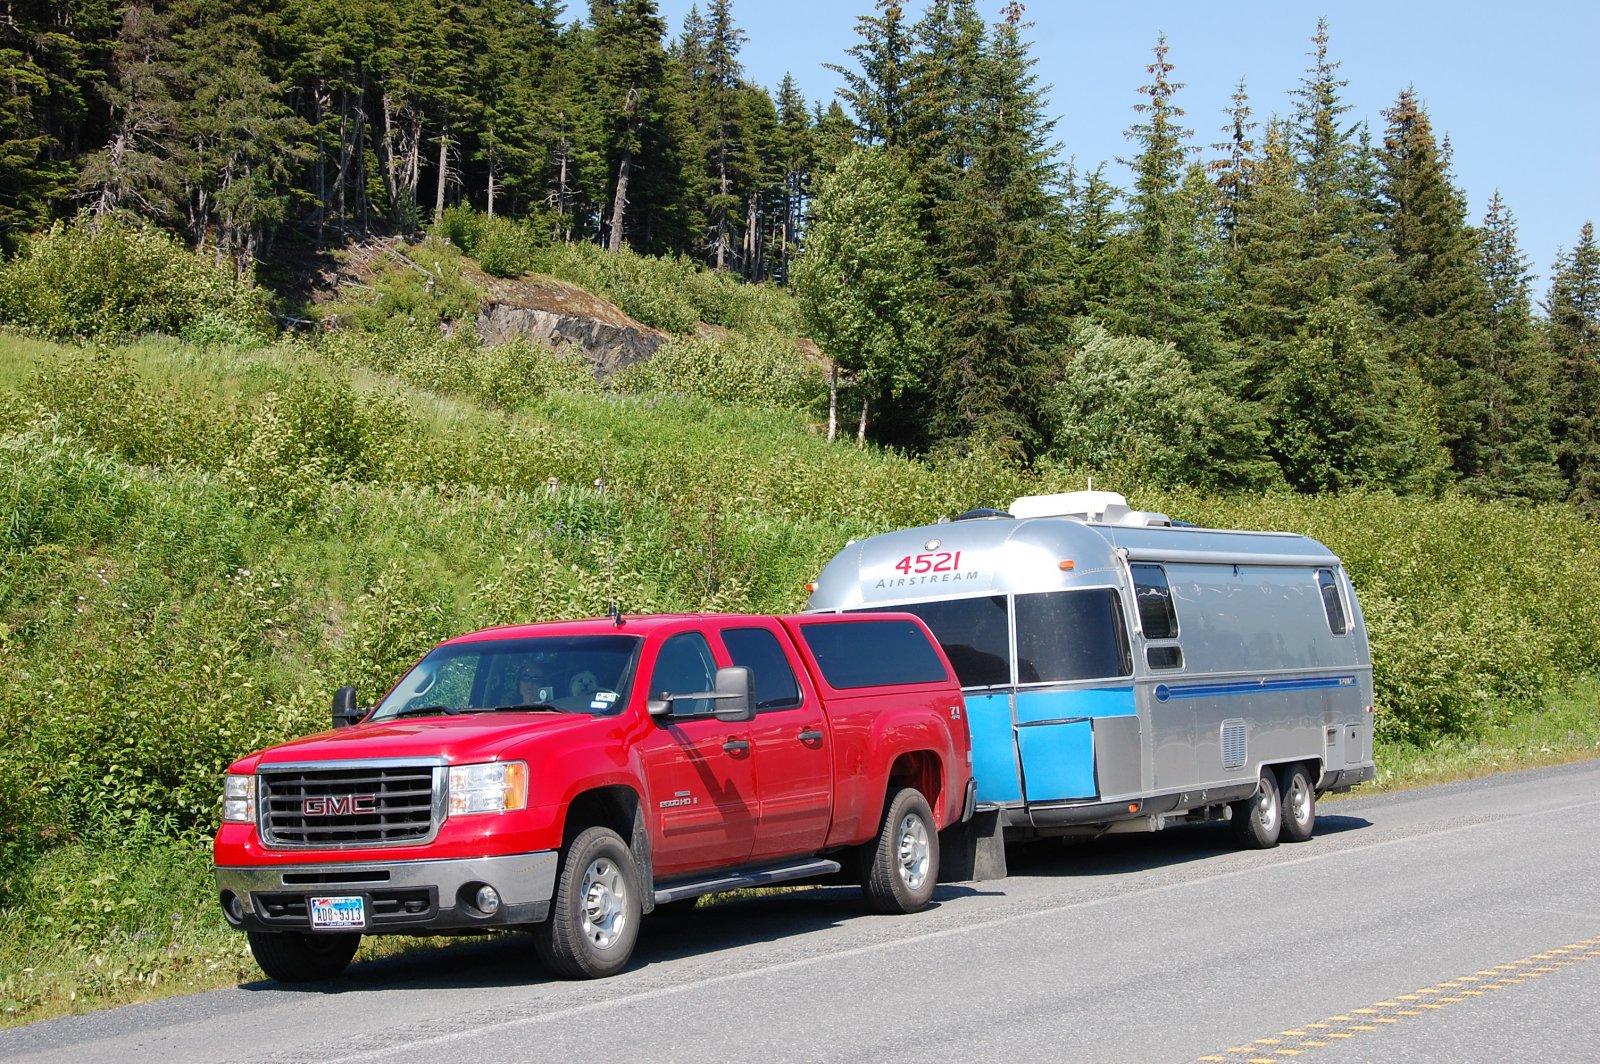 Click image for larger version  Name:Alaska Scenes 016.jpg Views:138 Size:611.7 KB ID:174065